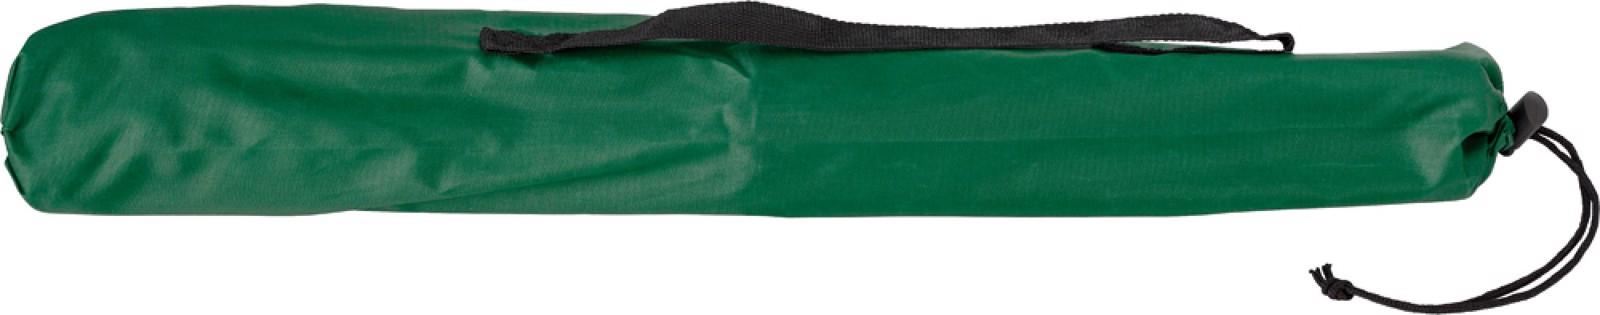 Polyester (600D) stool - Green